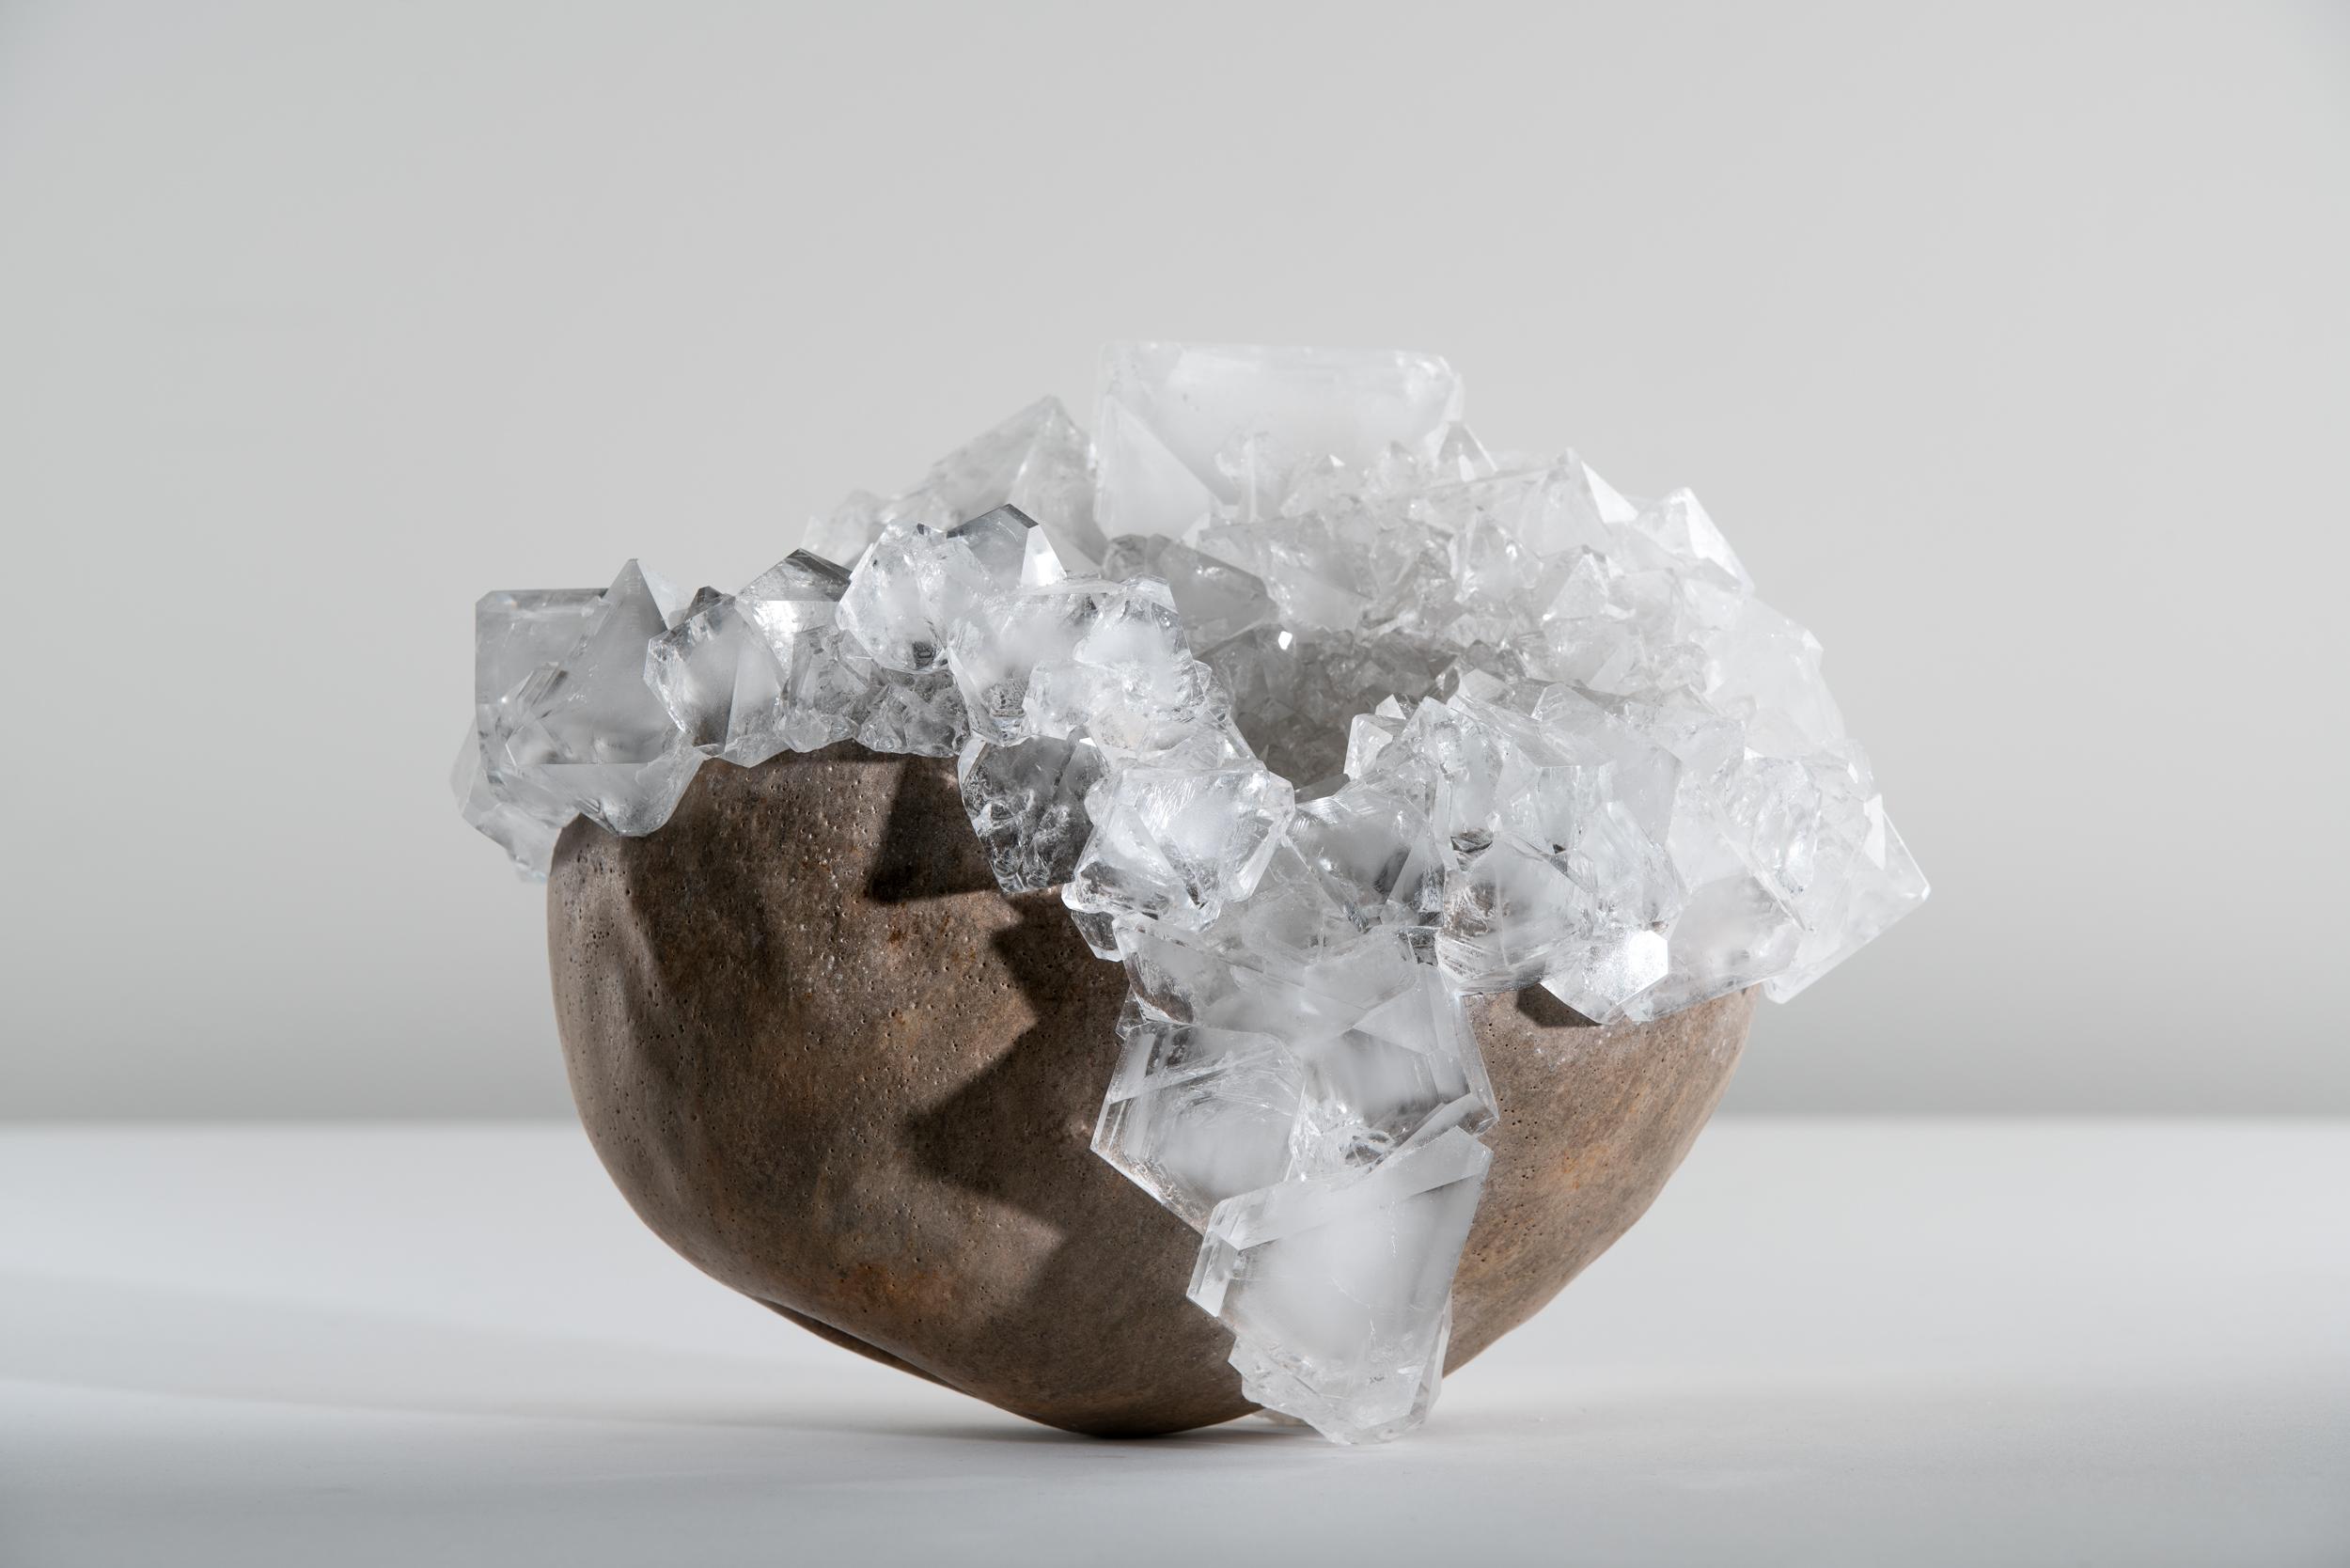 Crystallization 141